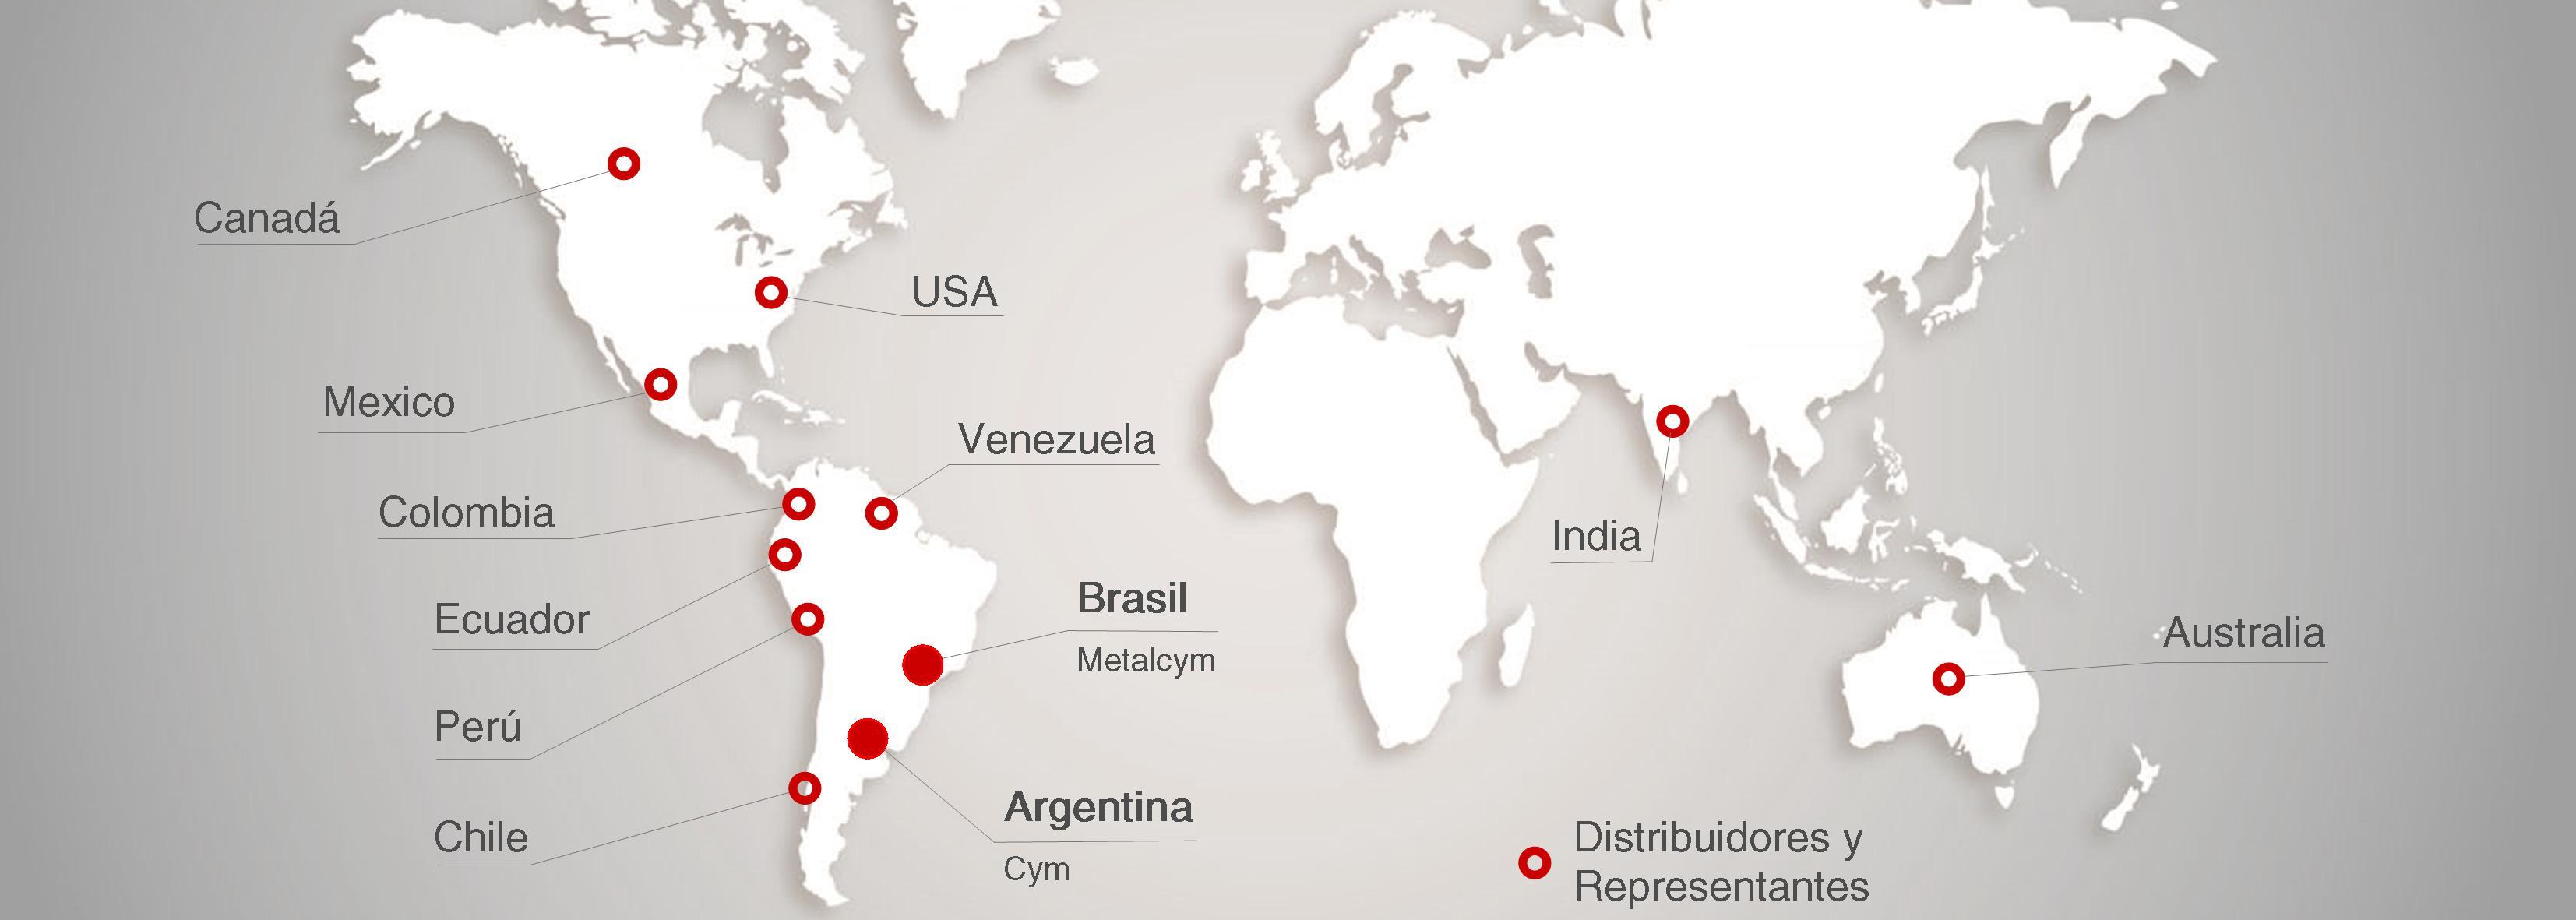 Mapa de contacto